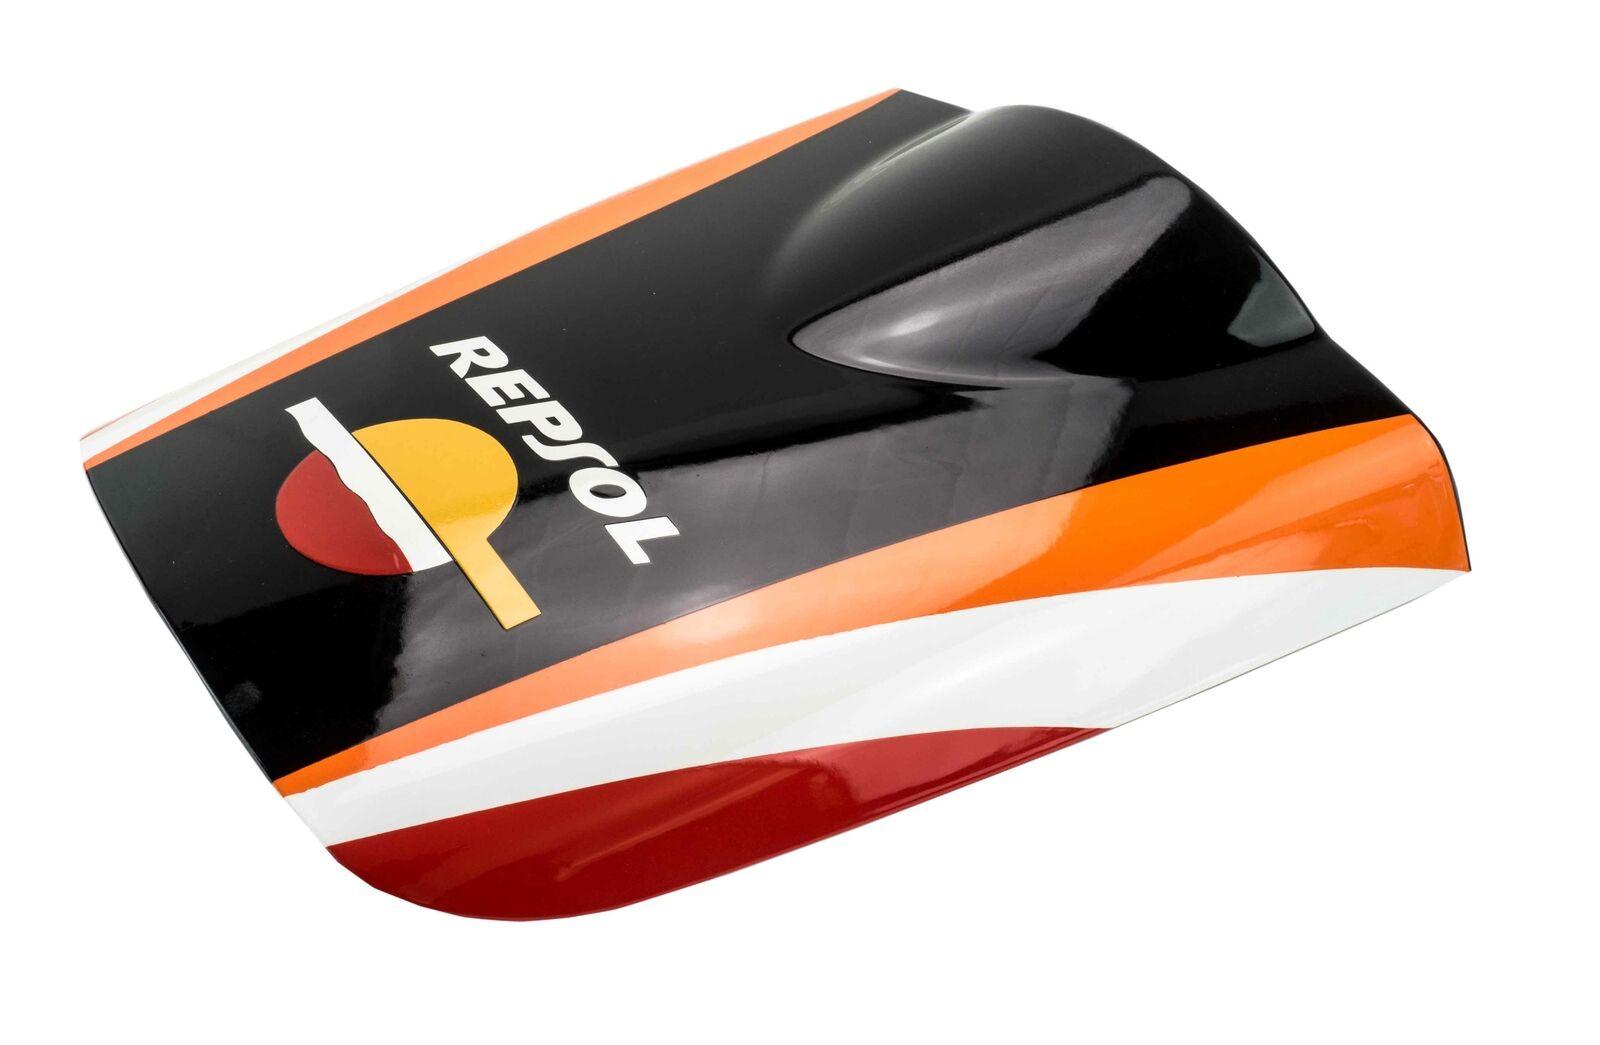 Sitzbank vorne Repsol Design passend f/ür Honda CBR600RR PC37 2003-2004